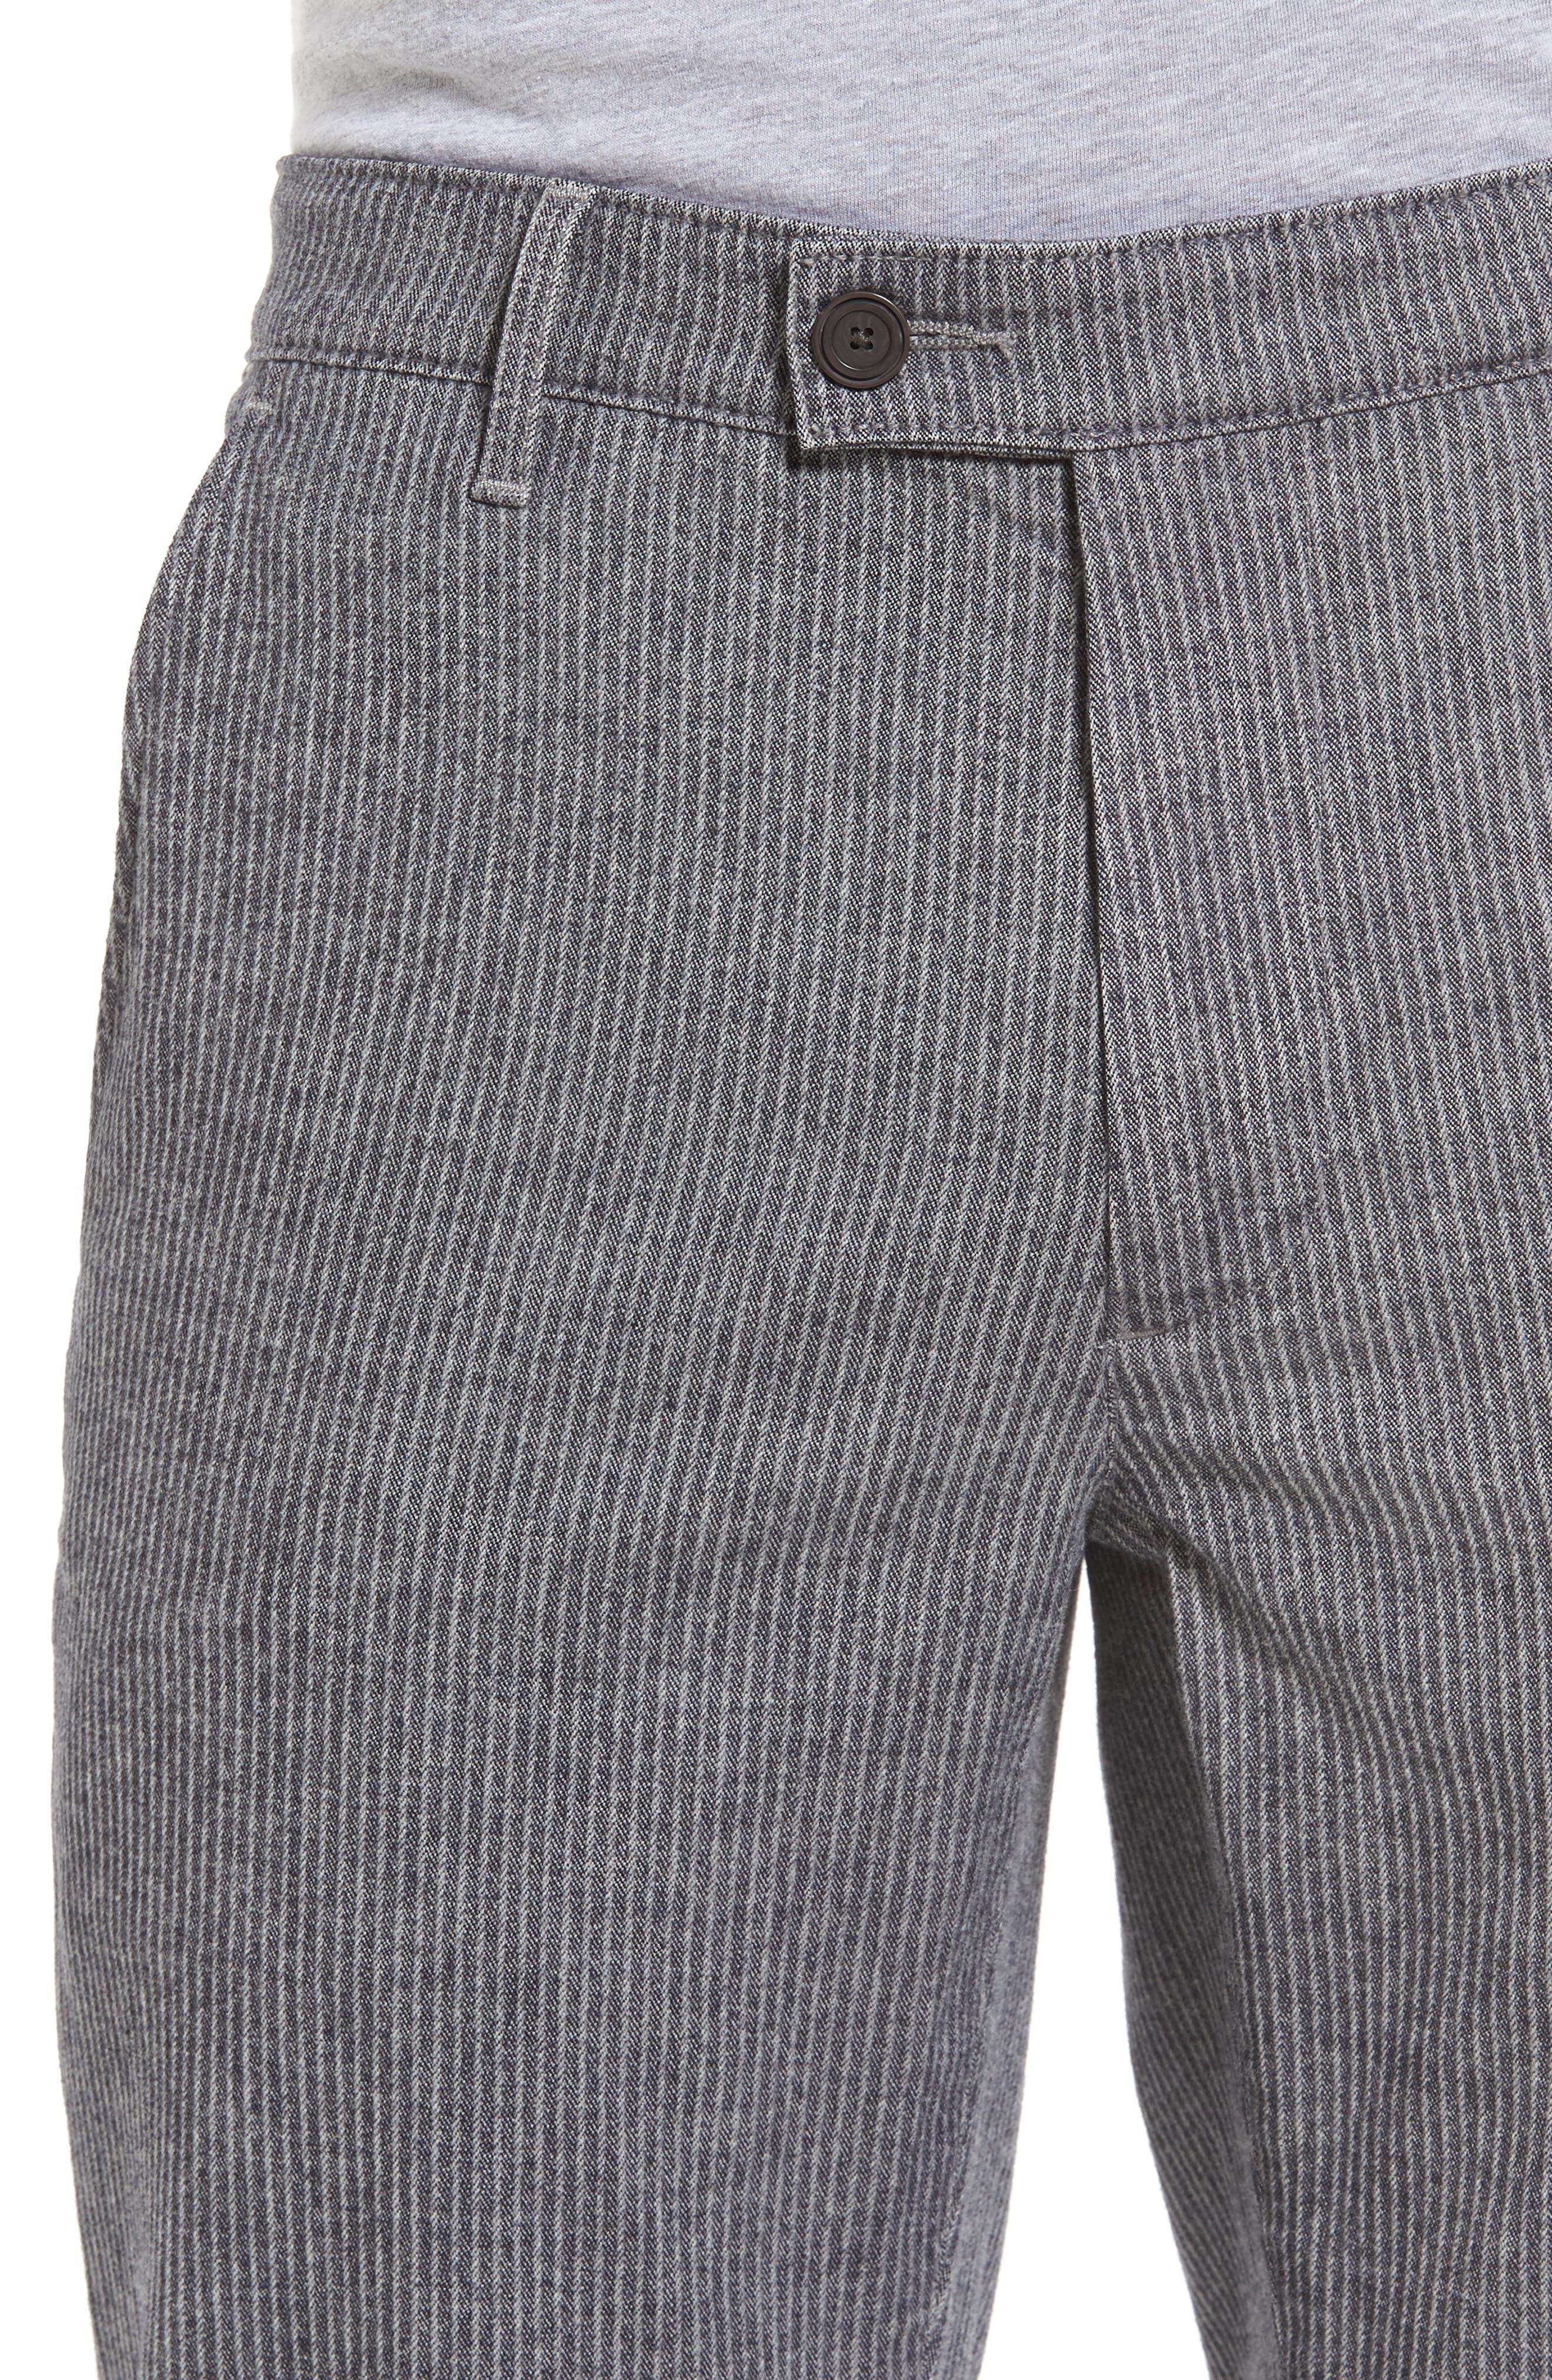 Marshall Slim Fit Pinstripe Pants,                             Alternate thumbnail 4, color,                             028